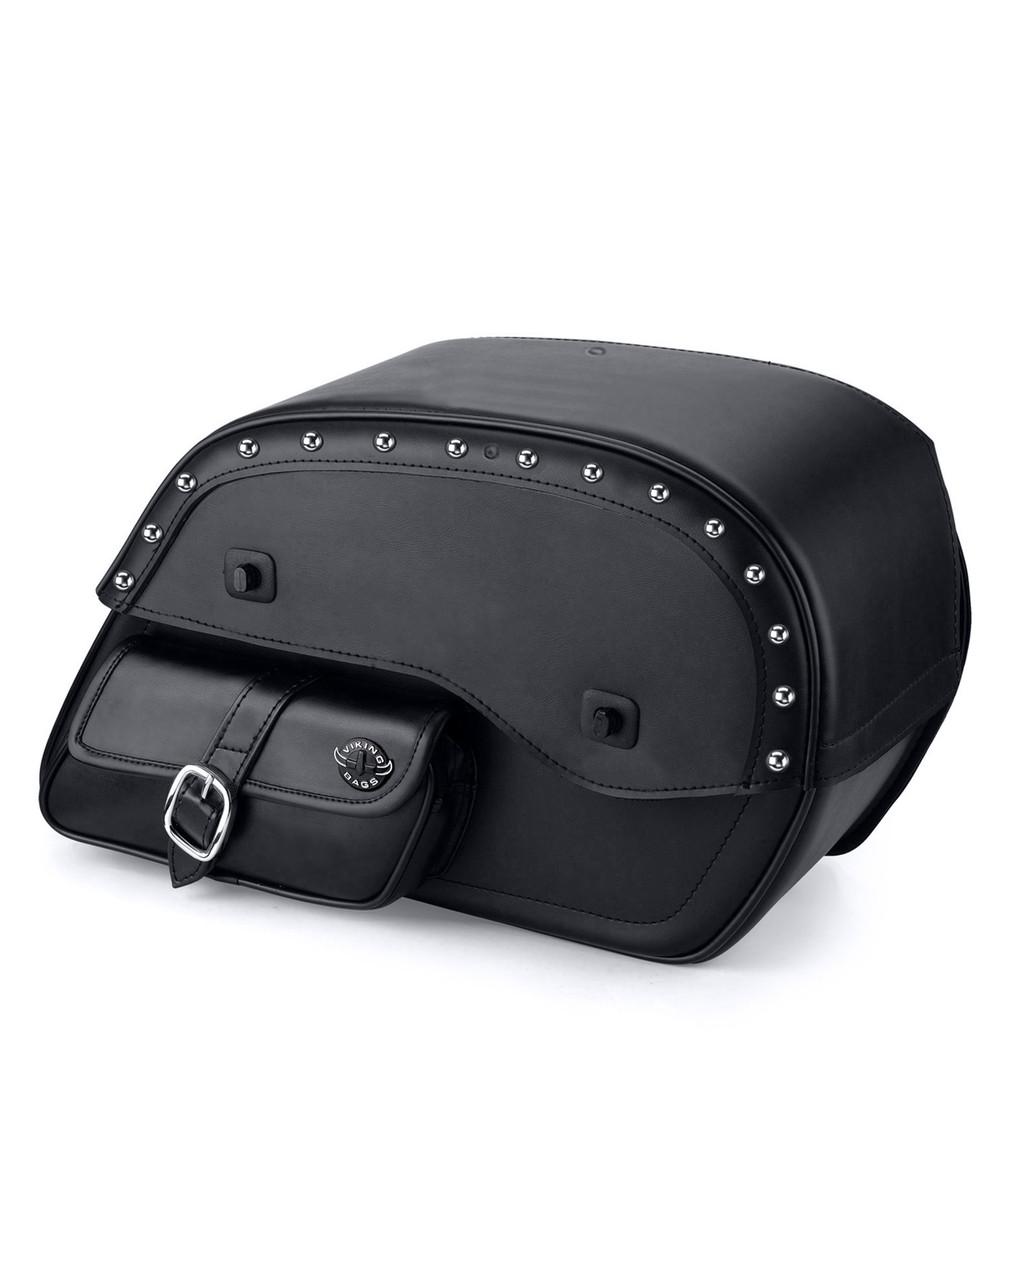 Viking SS Side Pocket Studded Large Motorcycle Saddlebags For Harley Softail Cross Bones FLSTSB Main Bag View